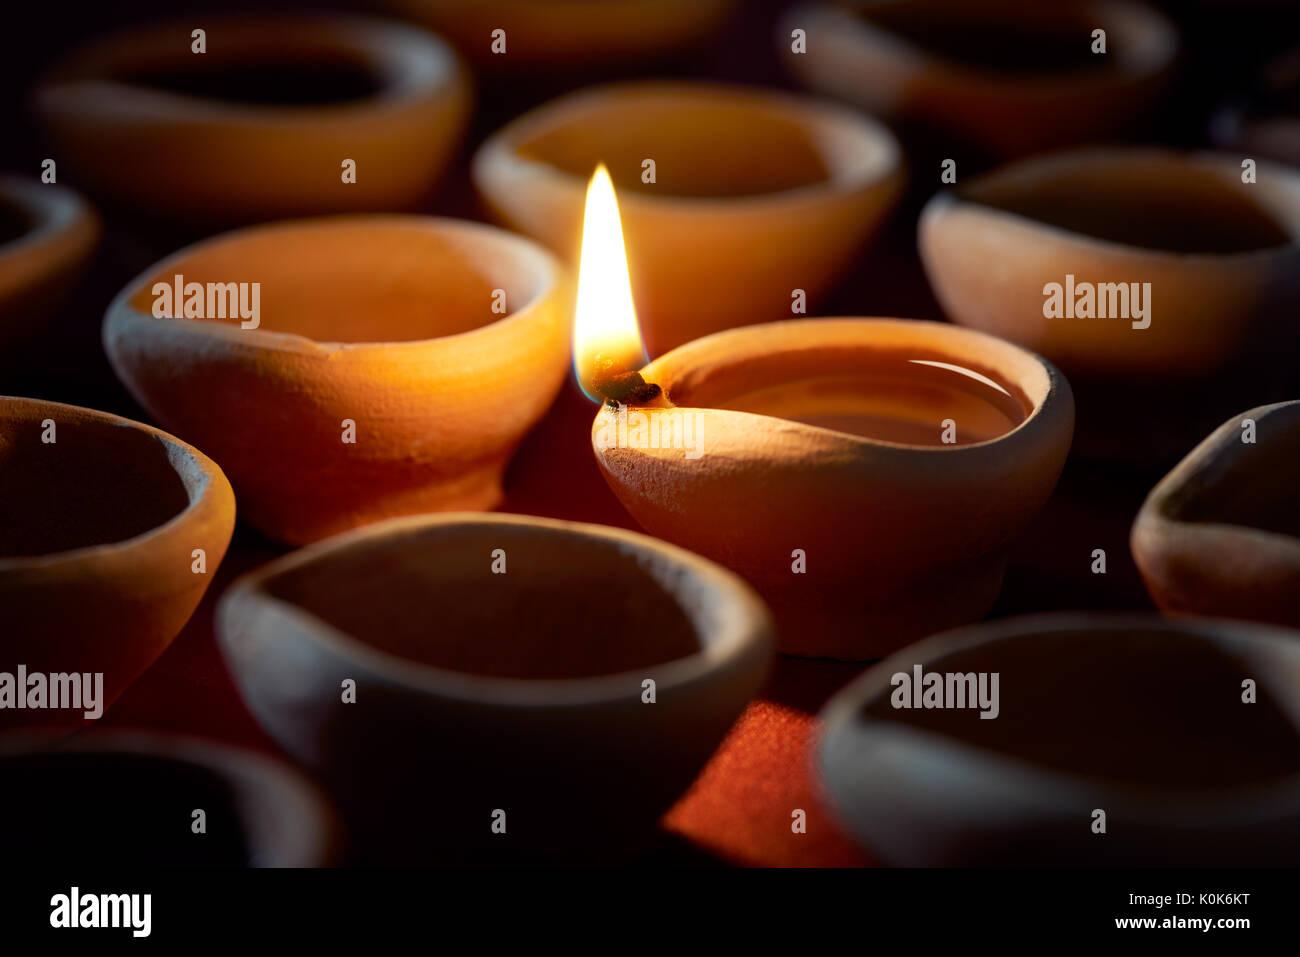 Traditional clay diya lamps lit during Diwali celetion Stock ... on diwali lanterns, diwali to learn words, diwali graphics, diwali festival, diwali greetings, diwali pooja, diwali decoration ideas, diwali clip art, diwali gods, diwali goddess coloring page, diwali rangoli, diwali animated, diwali celebrations in trinidad and tobago, diwali lakshmi, diwali fireworks, diwali diva, diwali in dipa, diwali celebration india, diwali lights, diwali aarti thali decoration,